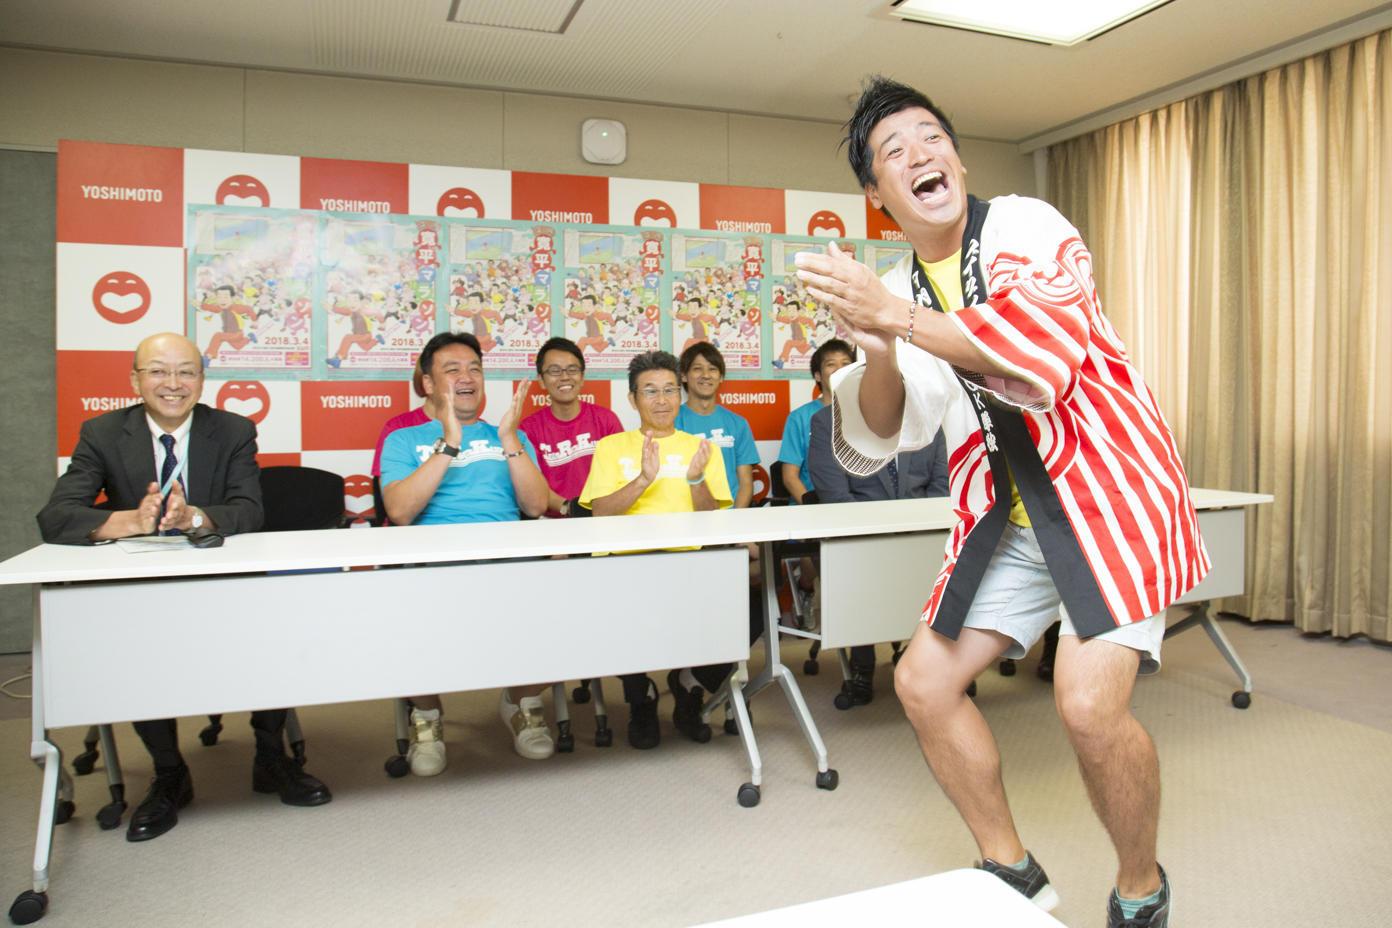 http://news.yoshimoto.co.jp/20170830175629-02aa2b4222f7eaf3e5632fce72f19464cec9a3c0.jpg